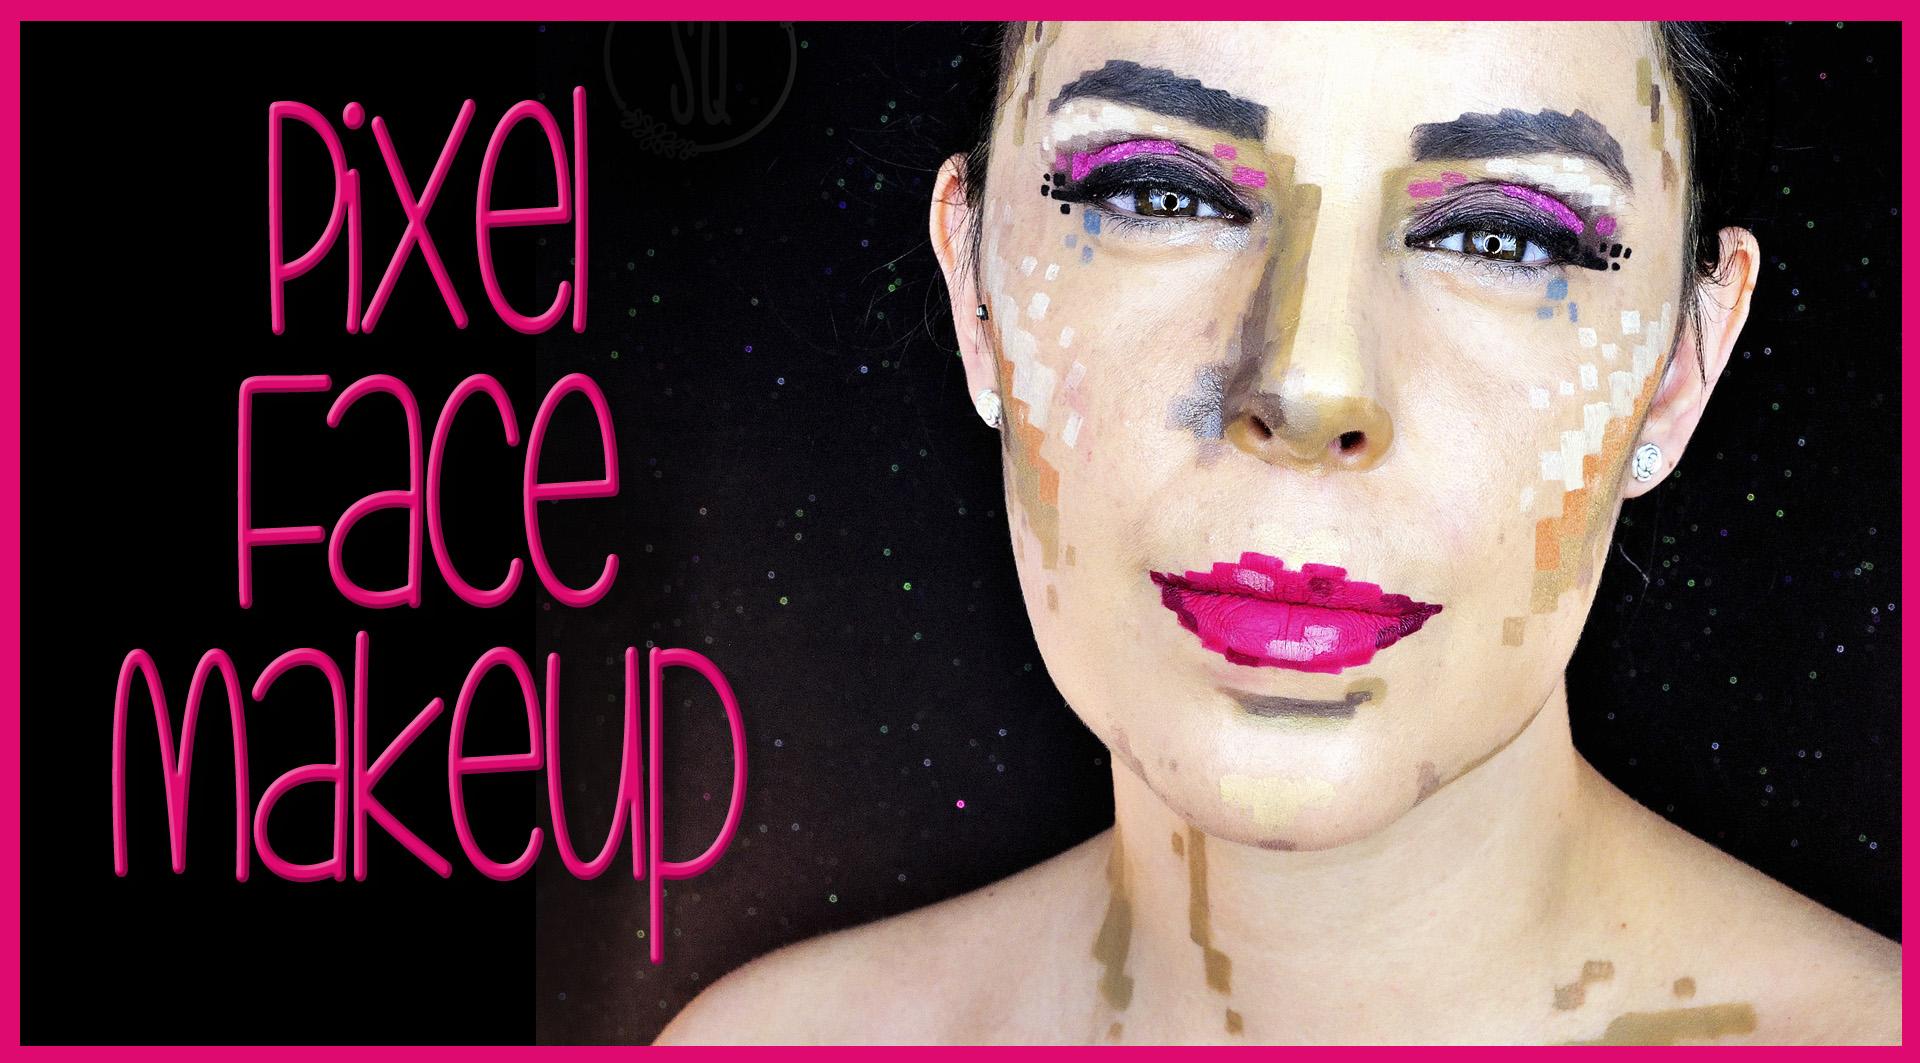 facial Galeria maquillaje fantasia